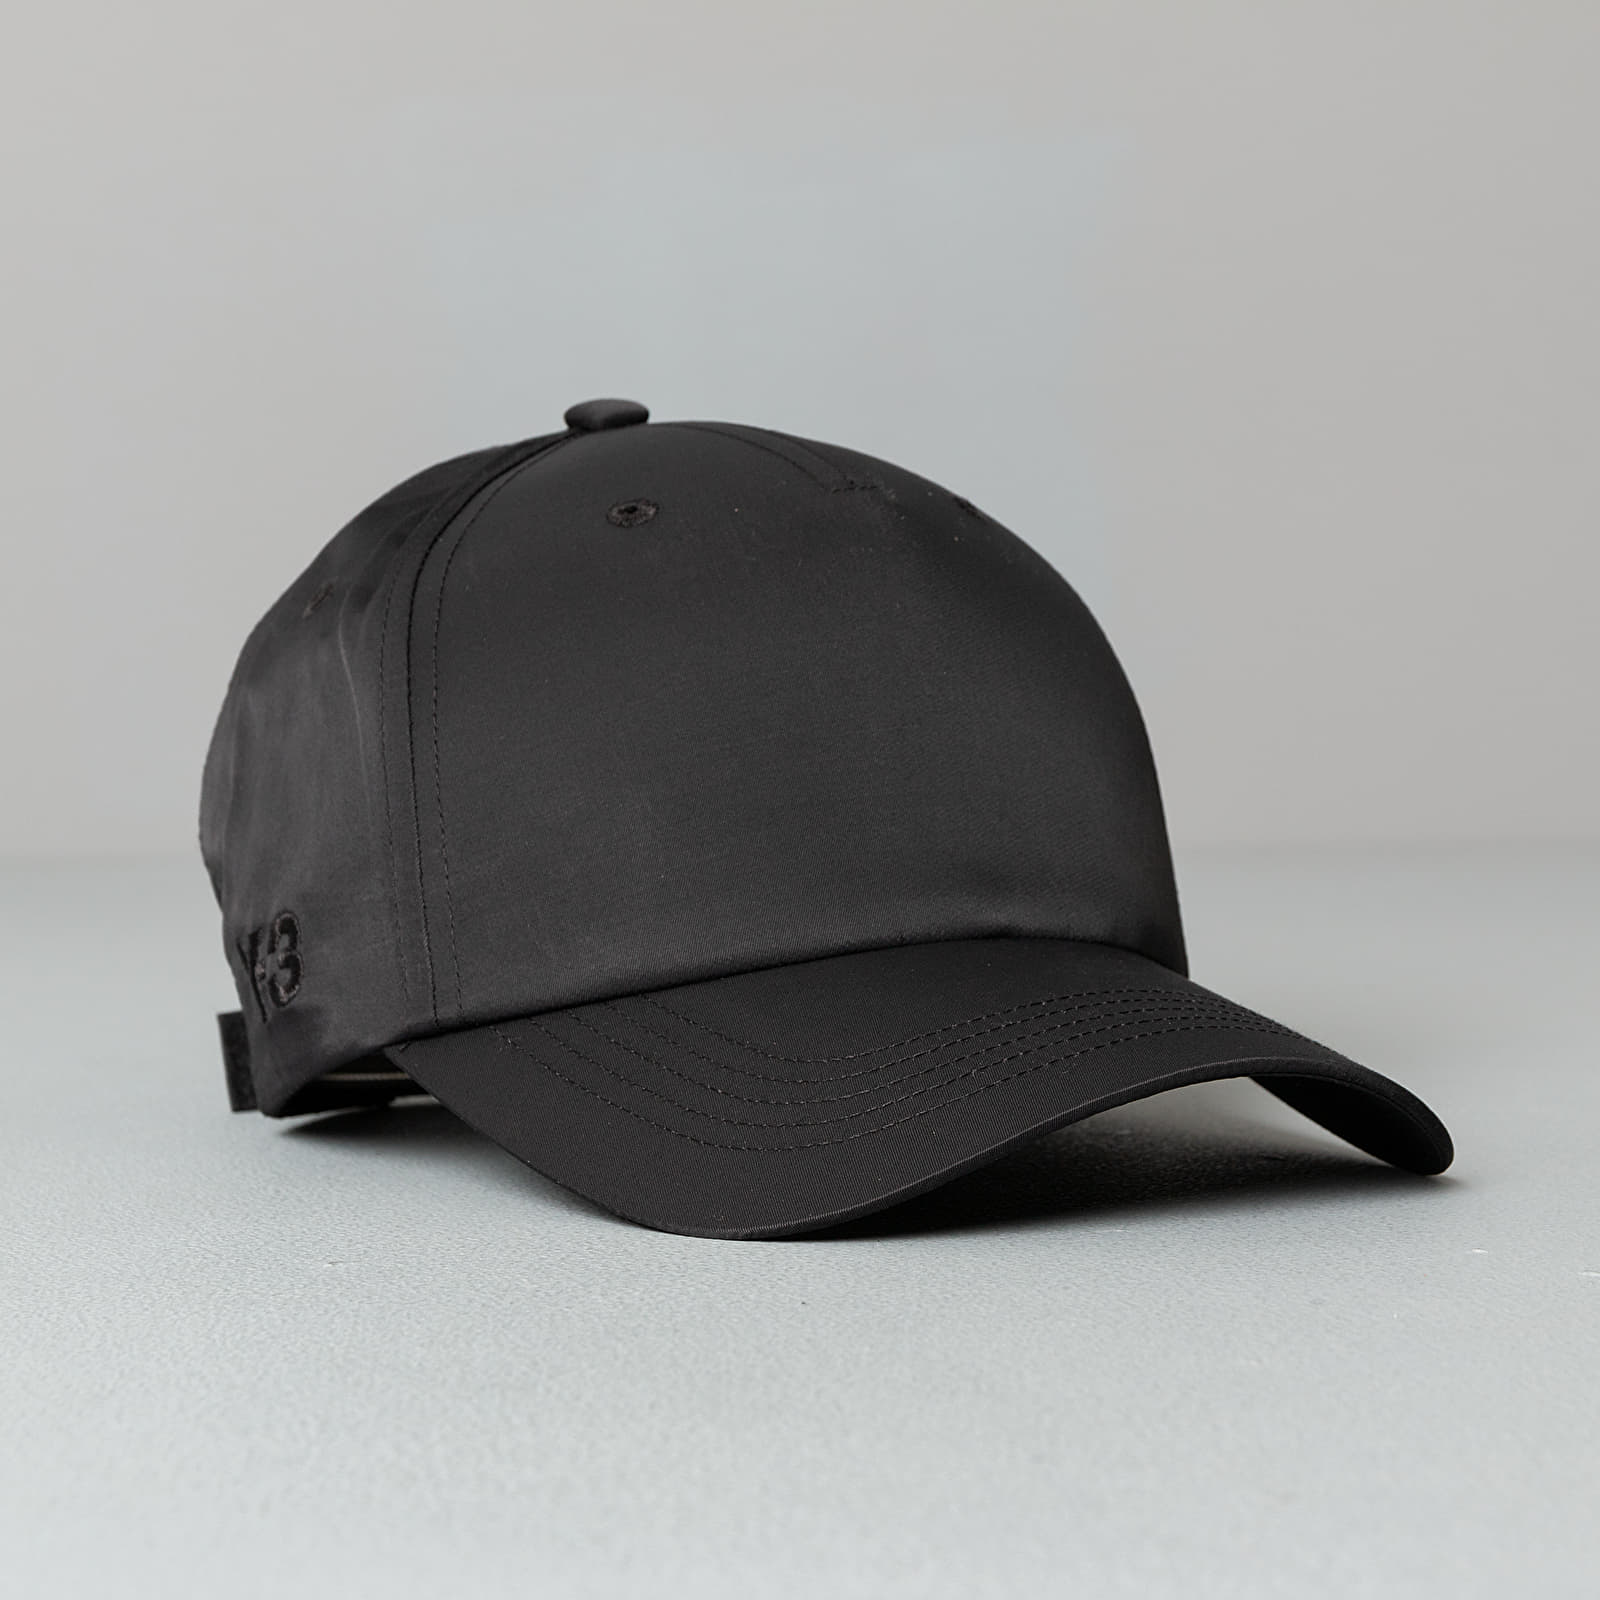 Kšiltovky Y-3 Nyl Cap Black